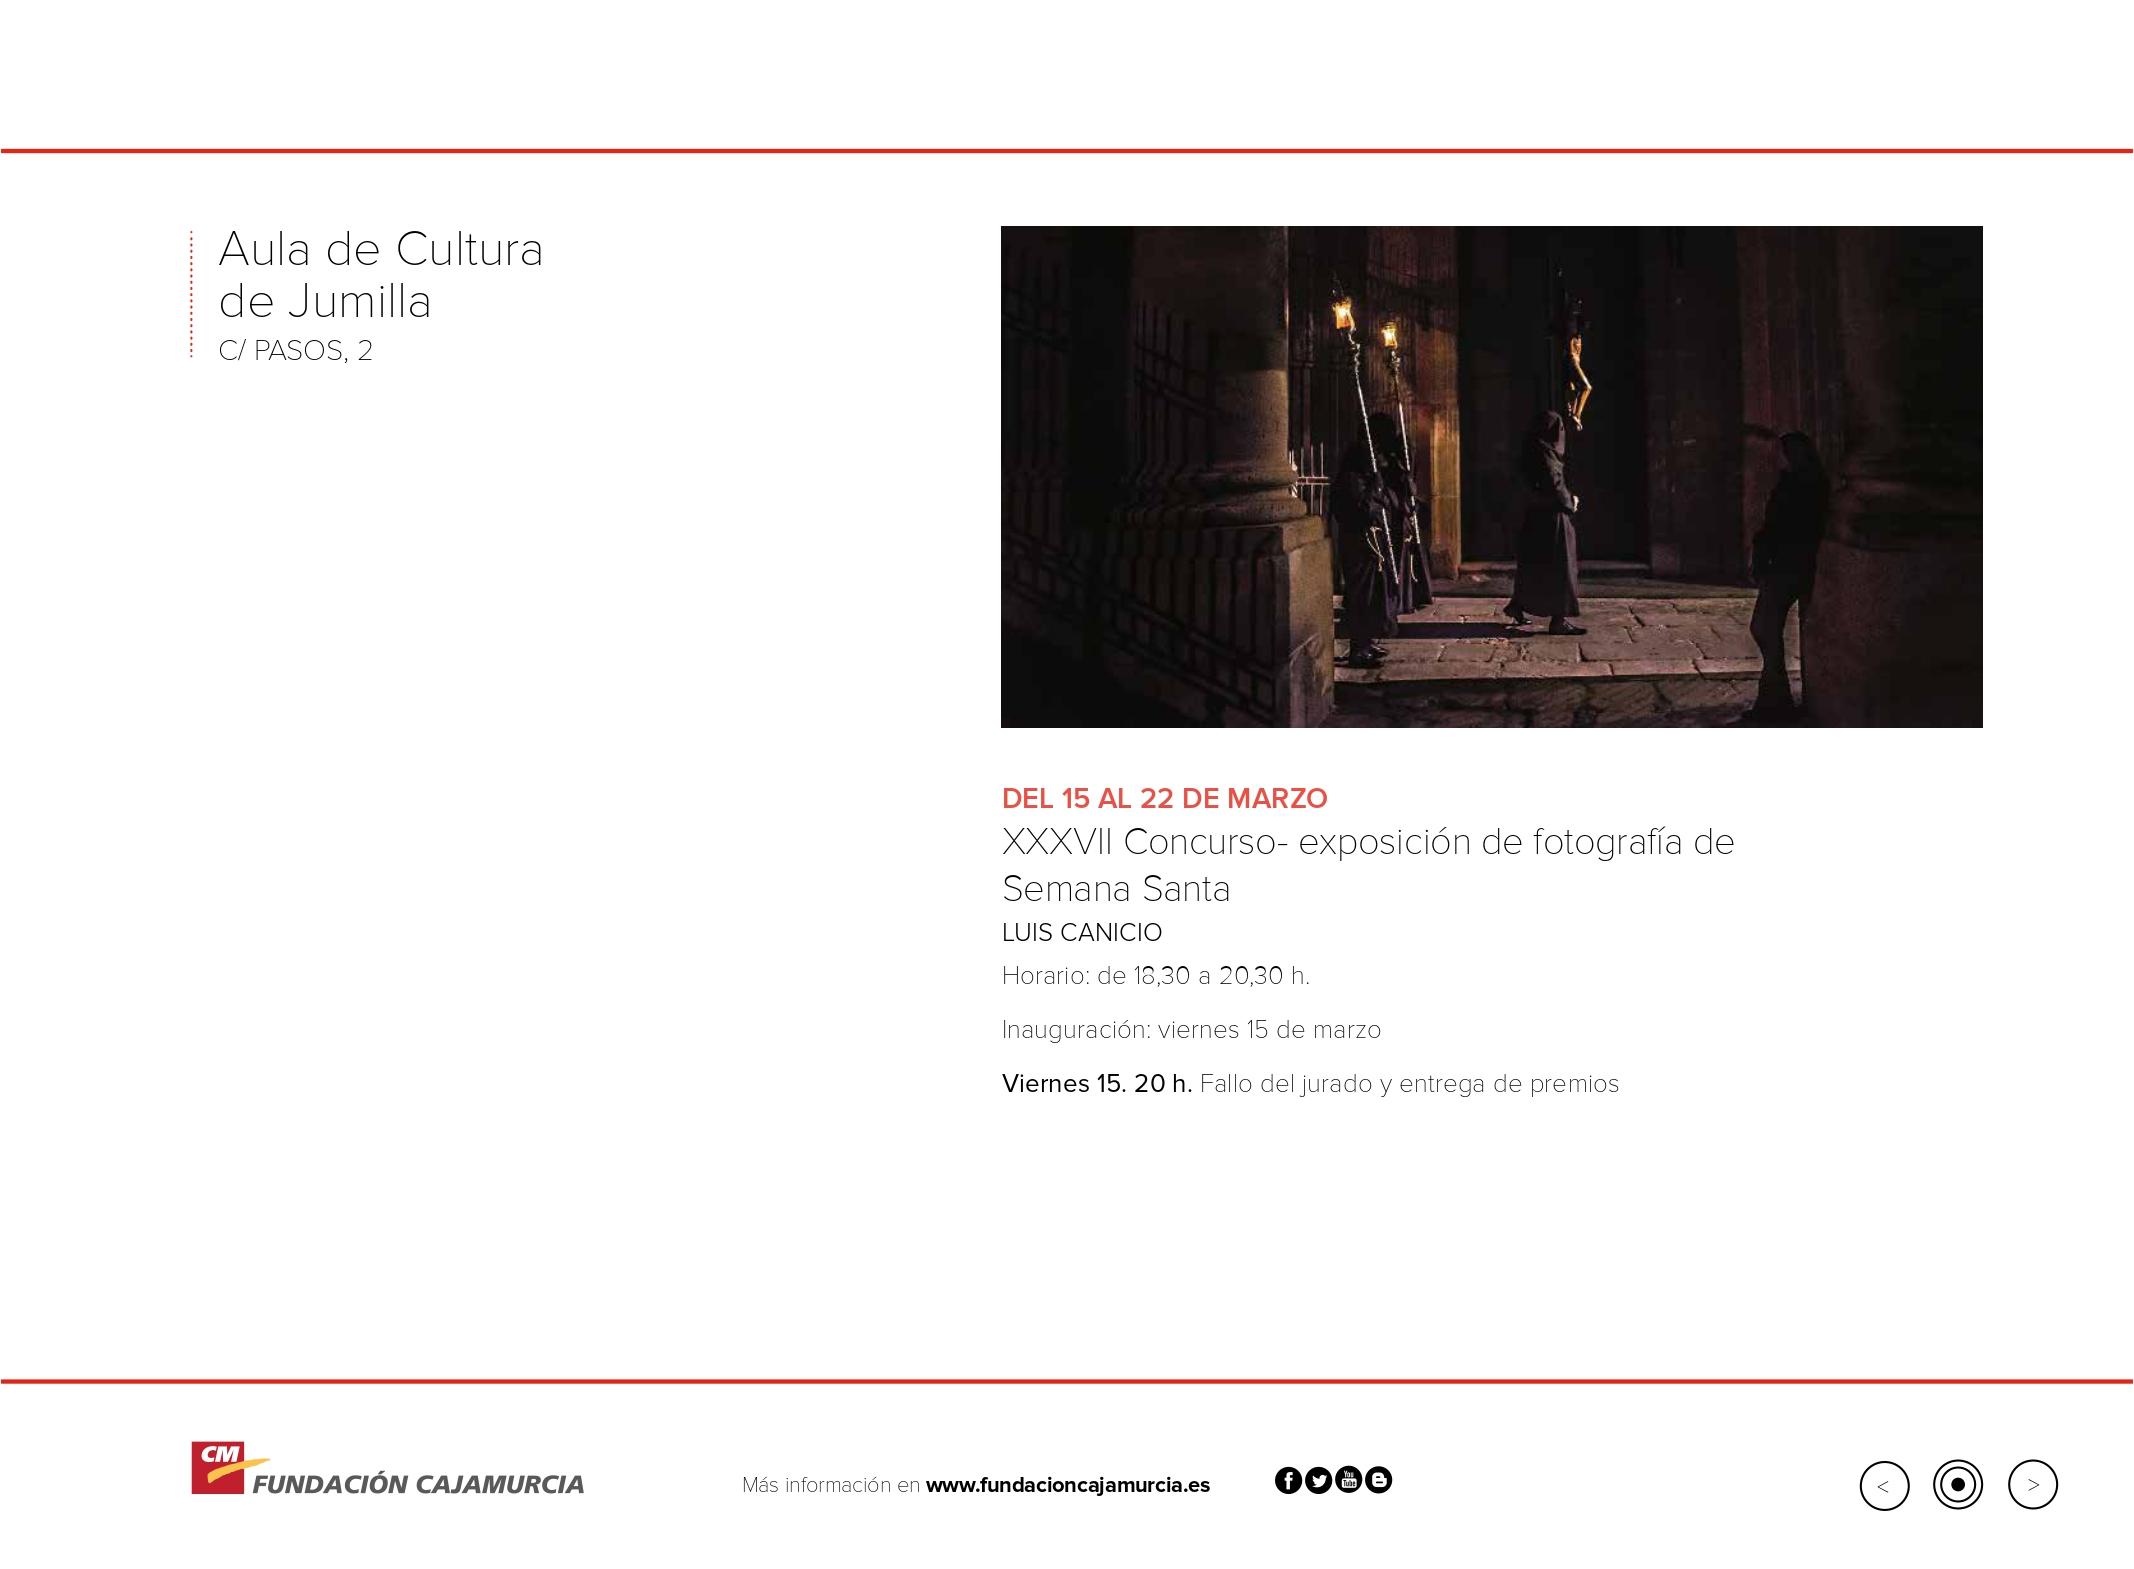 agenda-cajamurcia_page-0008.jpg